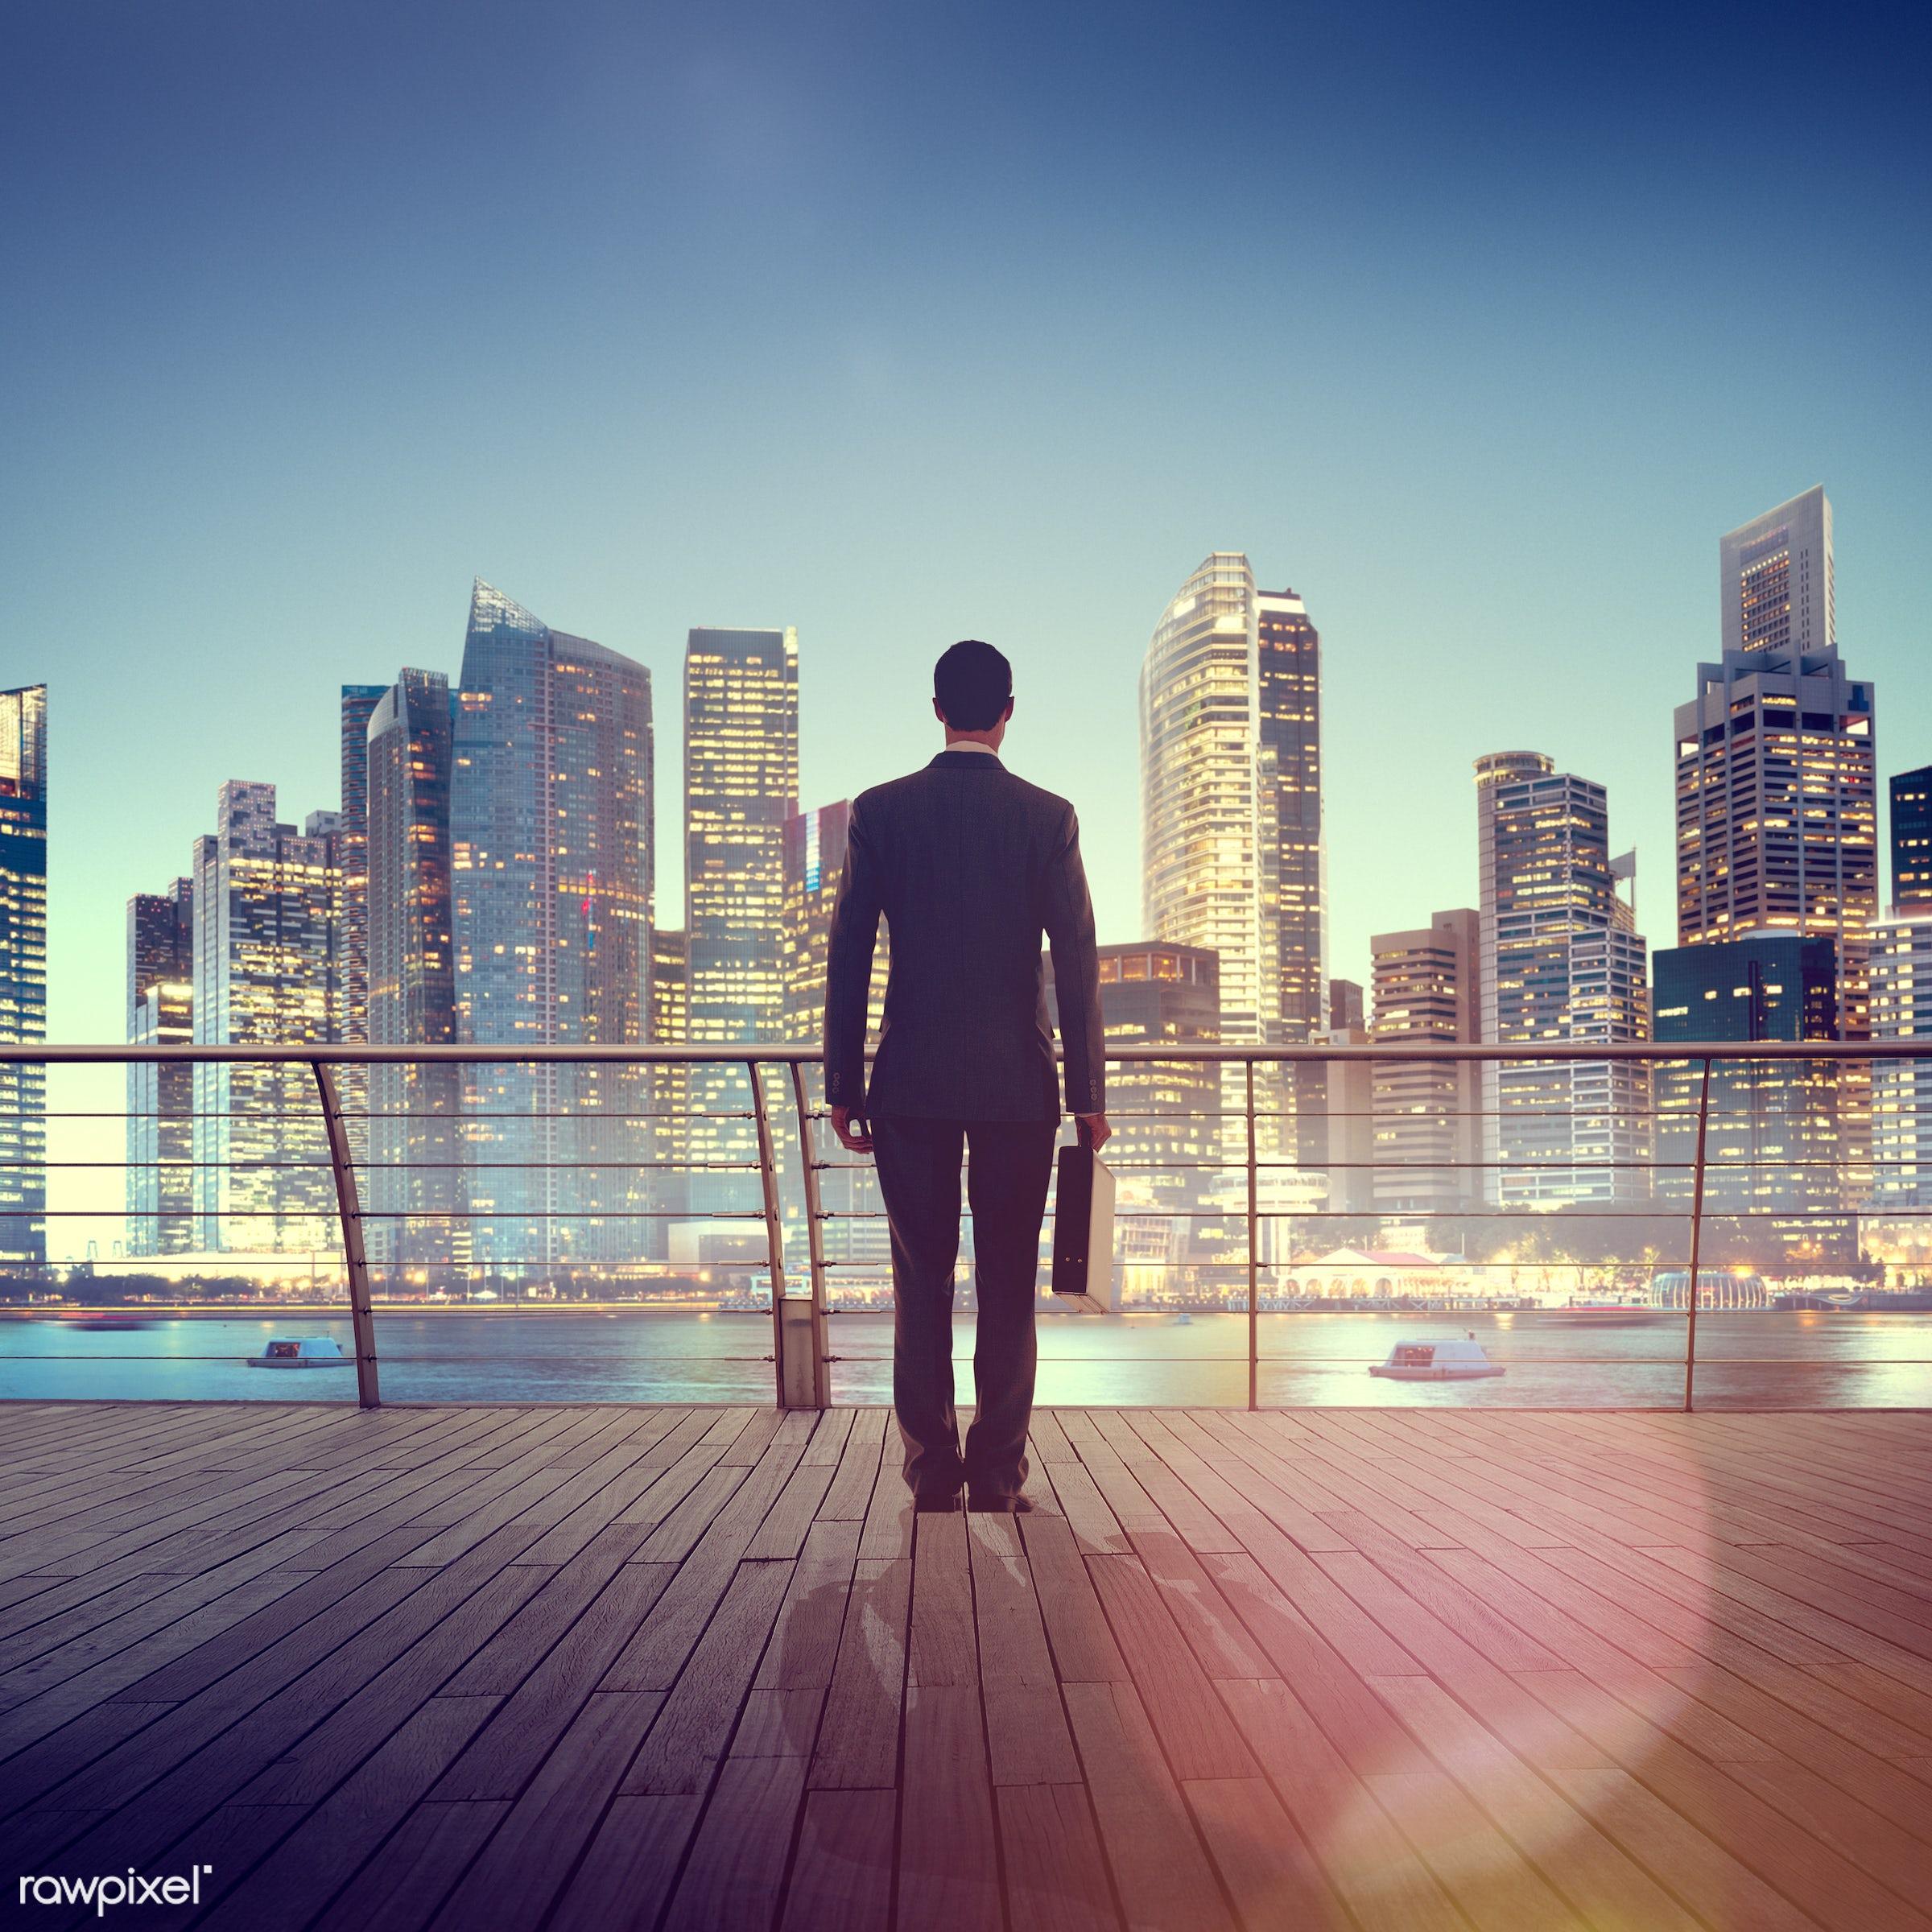 contemporary, Dusk, bar, building, business, businessman, city, city lights, cityscape, contemplation, corporate, harbor,...